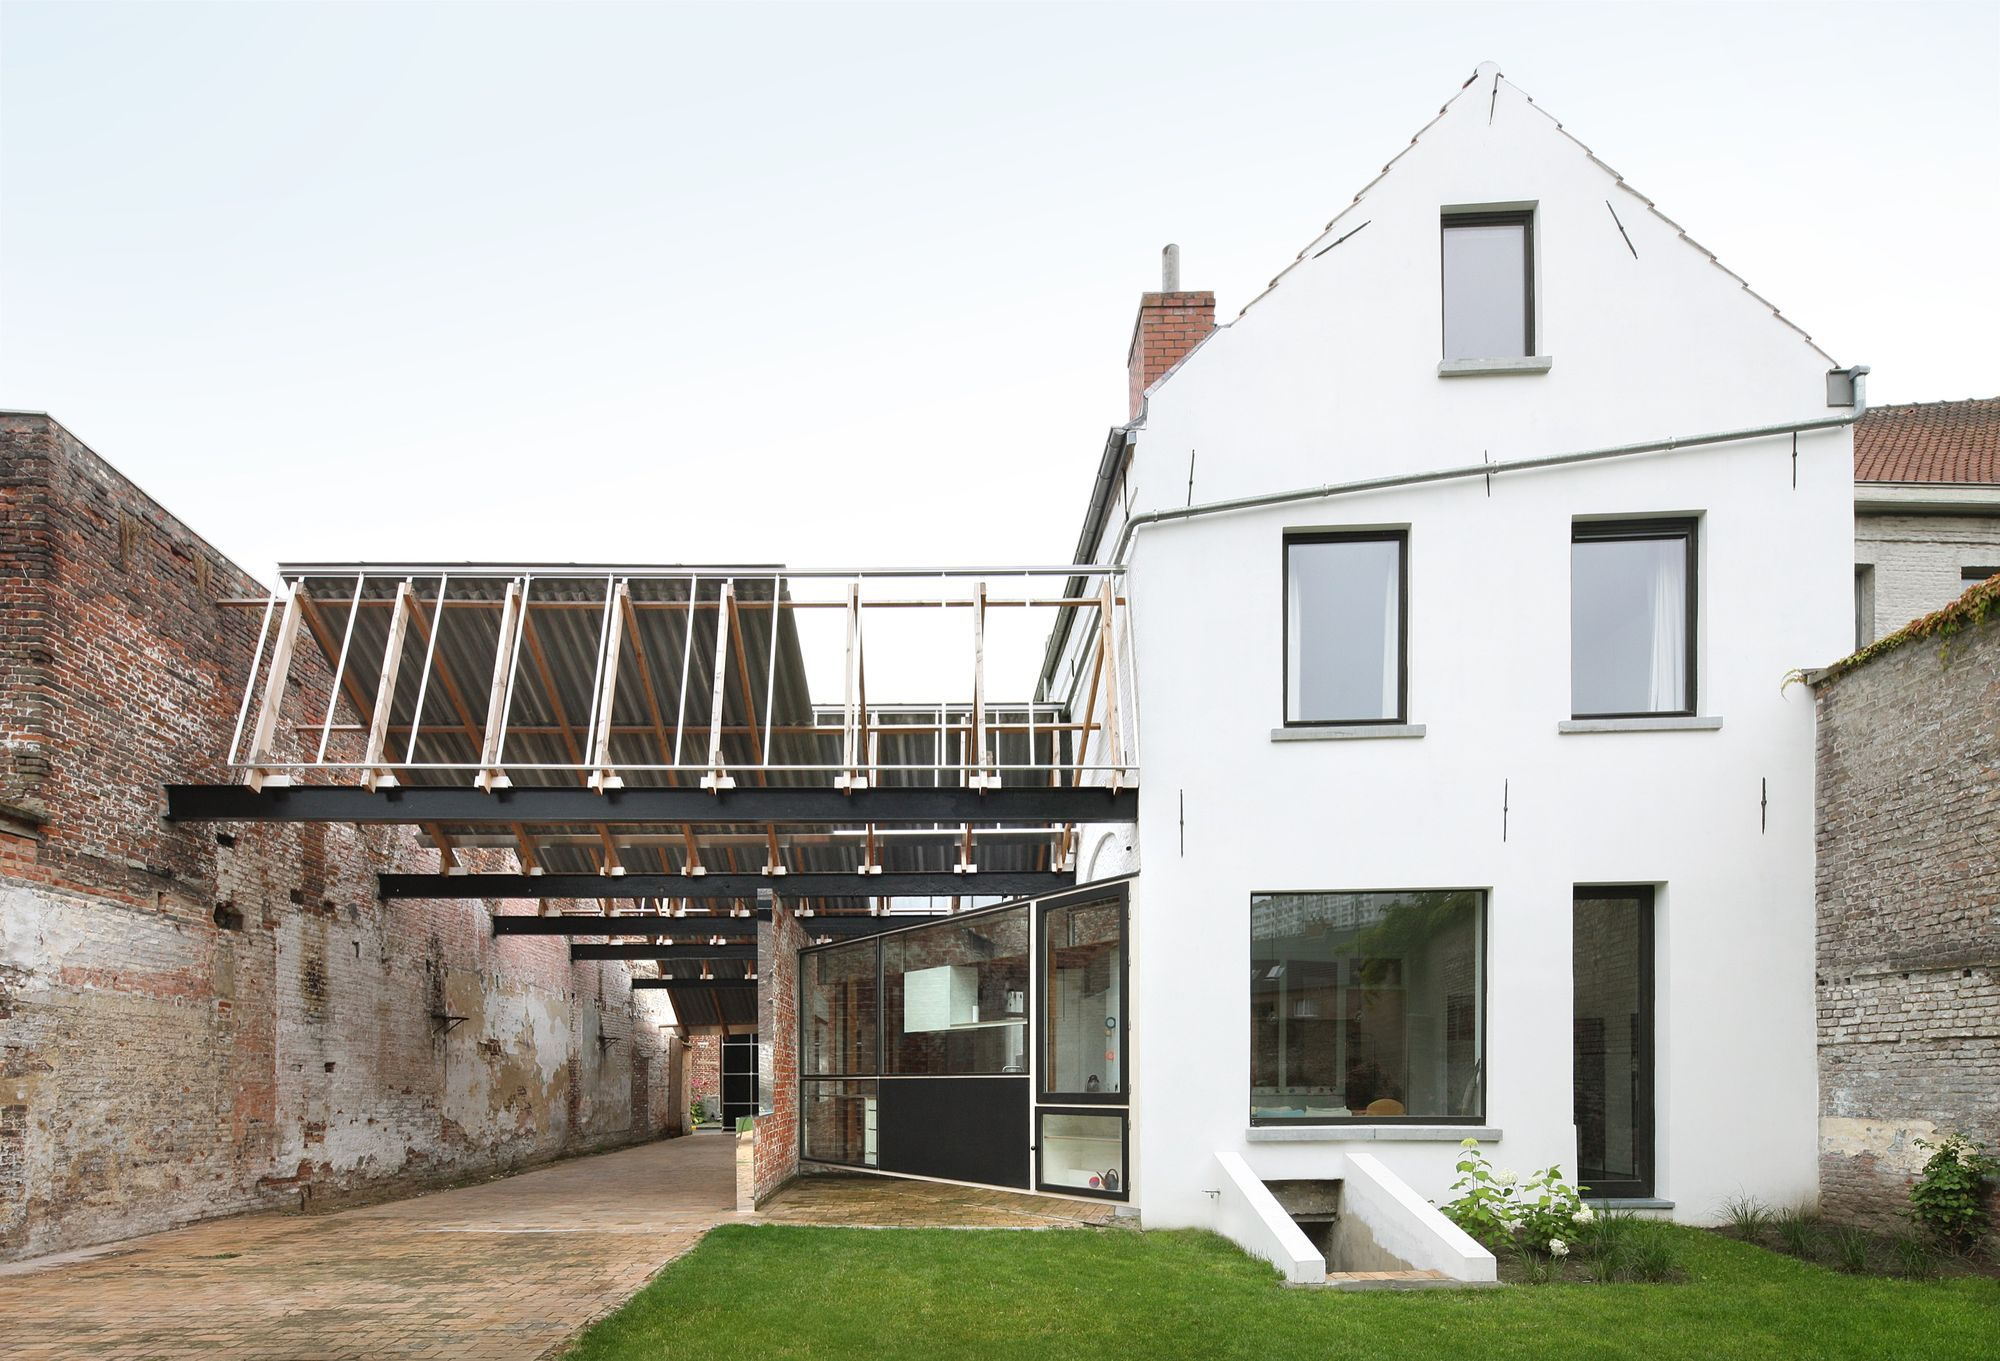 architecten de vylder vinck taillieu House Sanderswal Gent 1